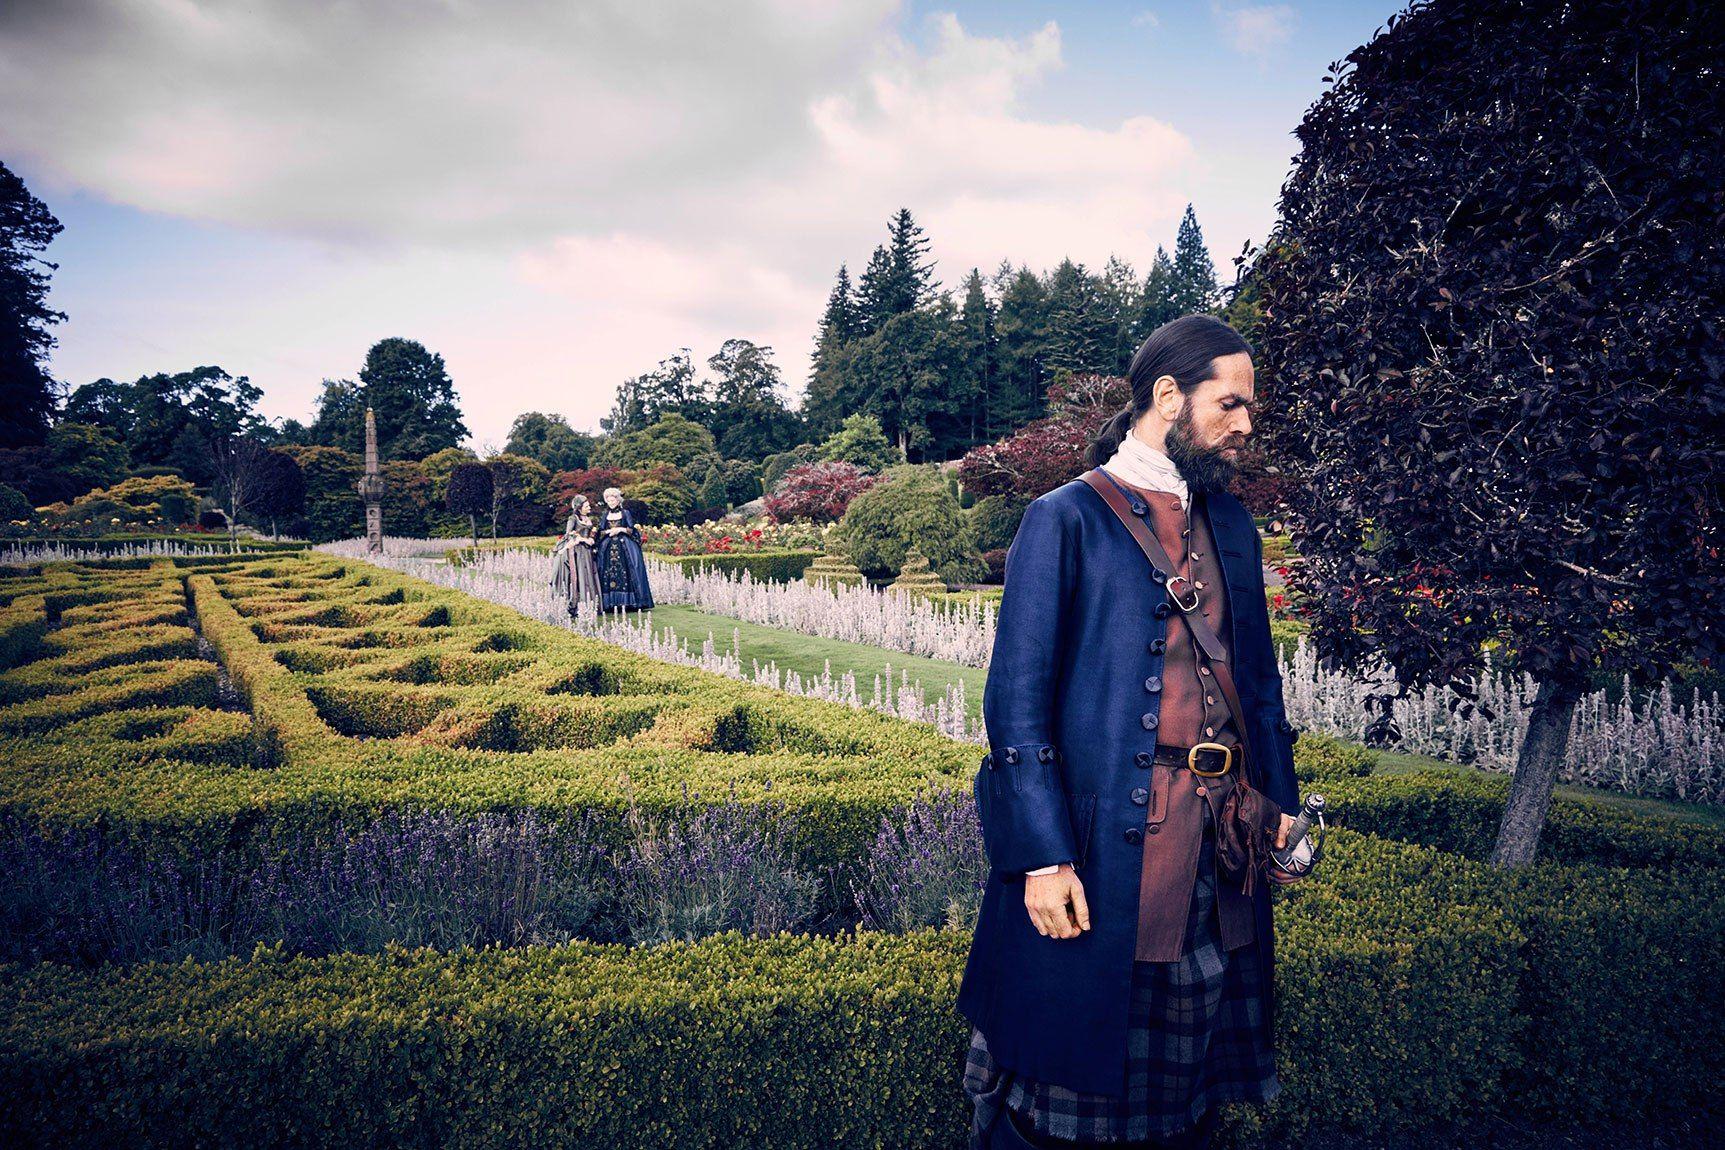 *New* Stills of the Outlander Cast from Season 2 | Outlander Online